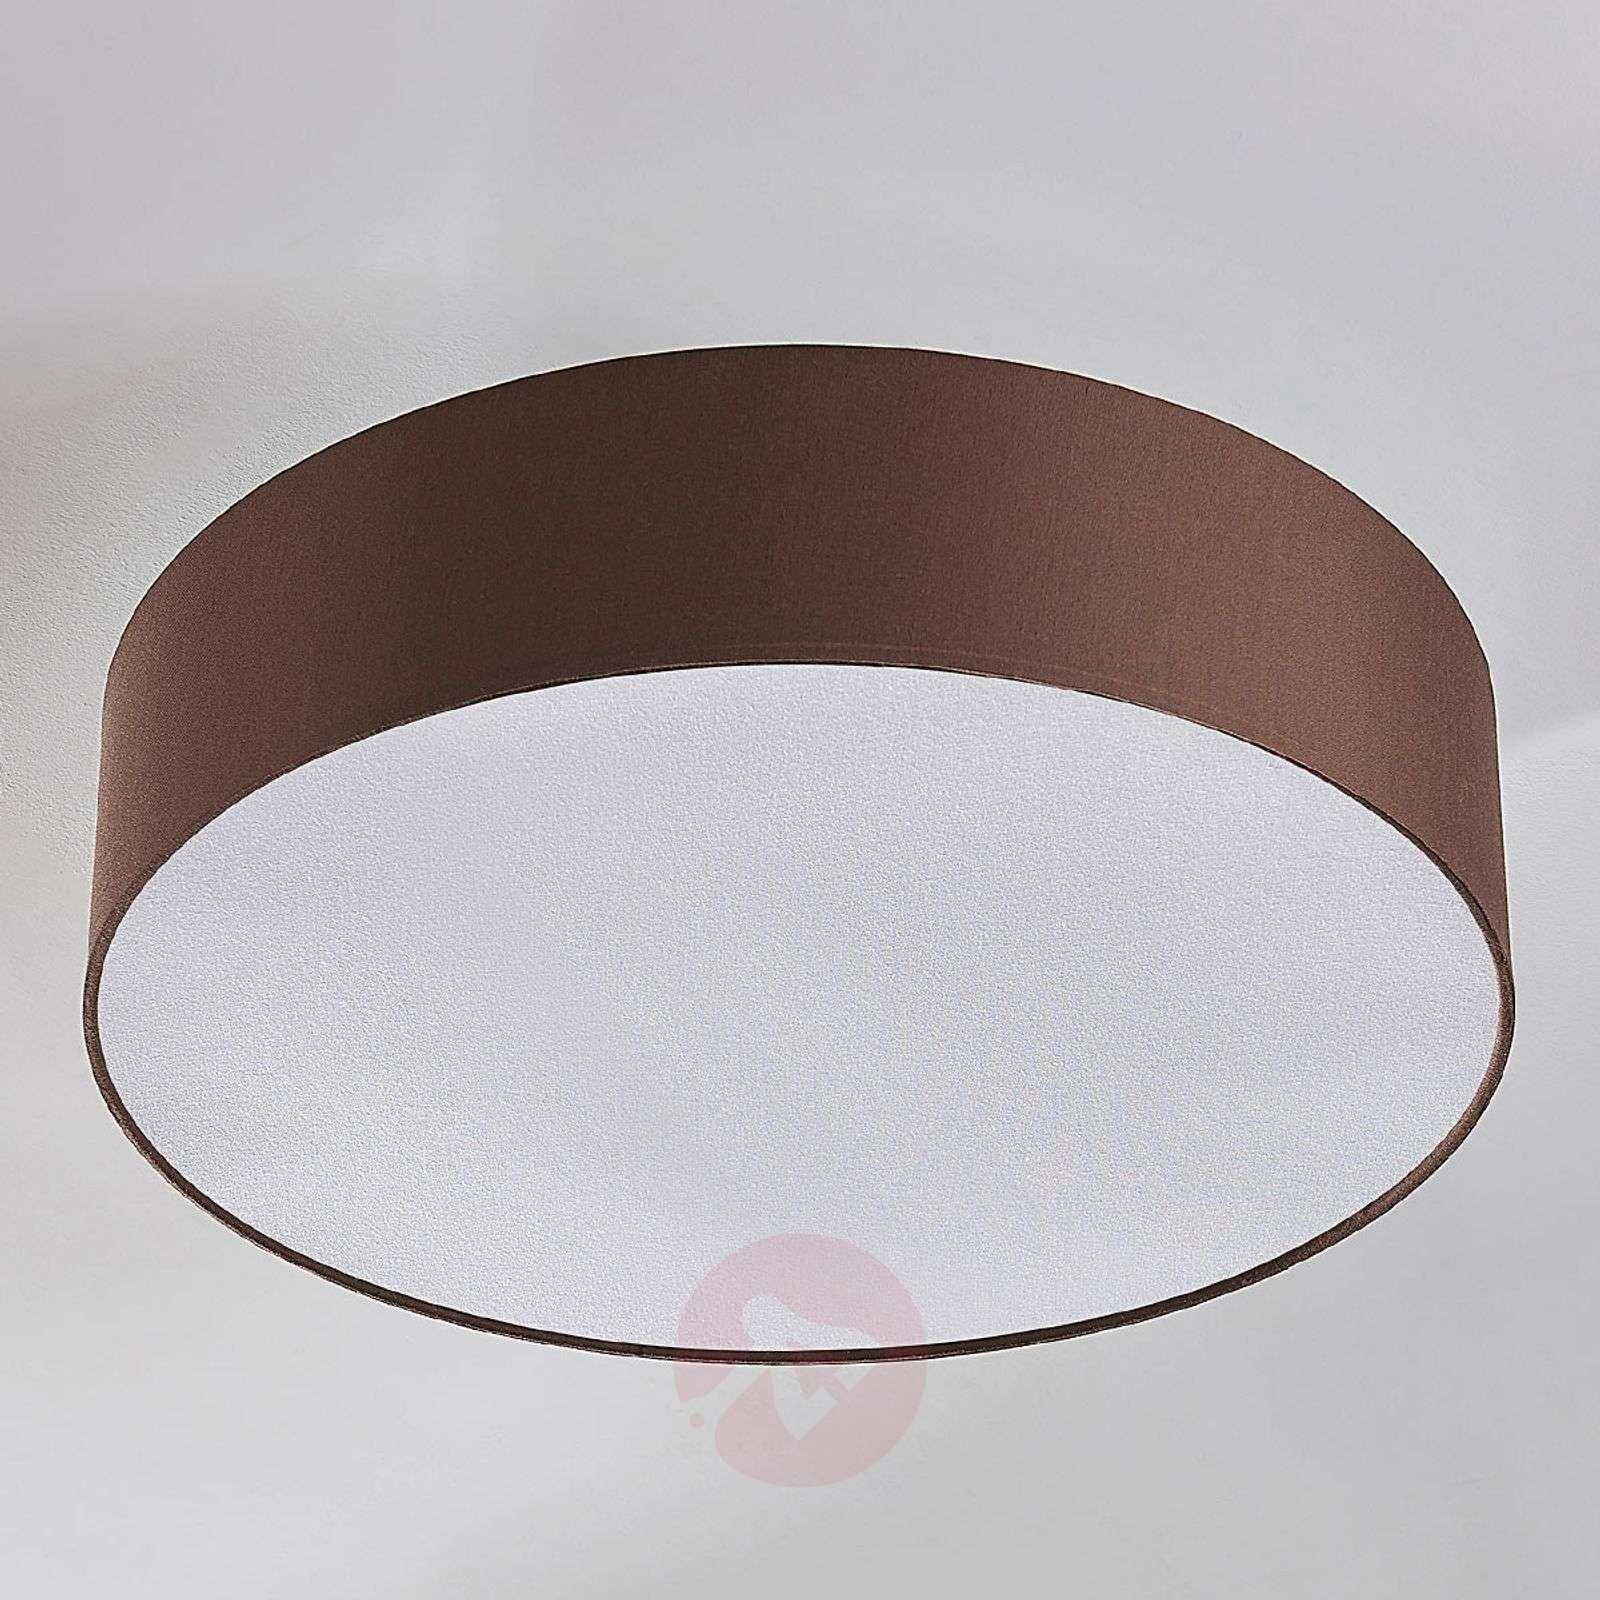 Kangaskattovalaisin Sebatin, E27-LED, vaaleanrusk.-9620331-01